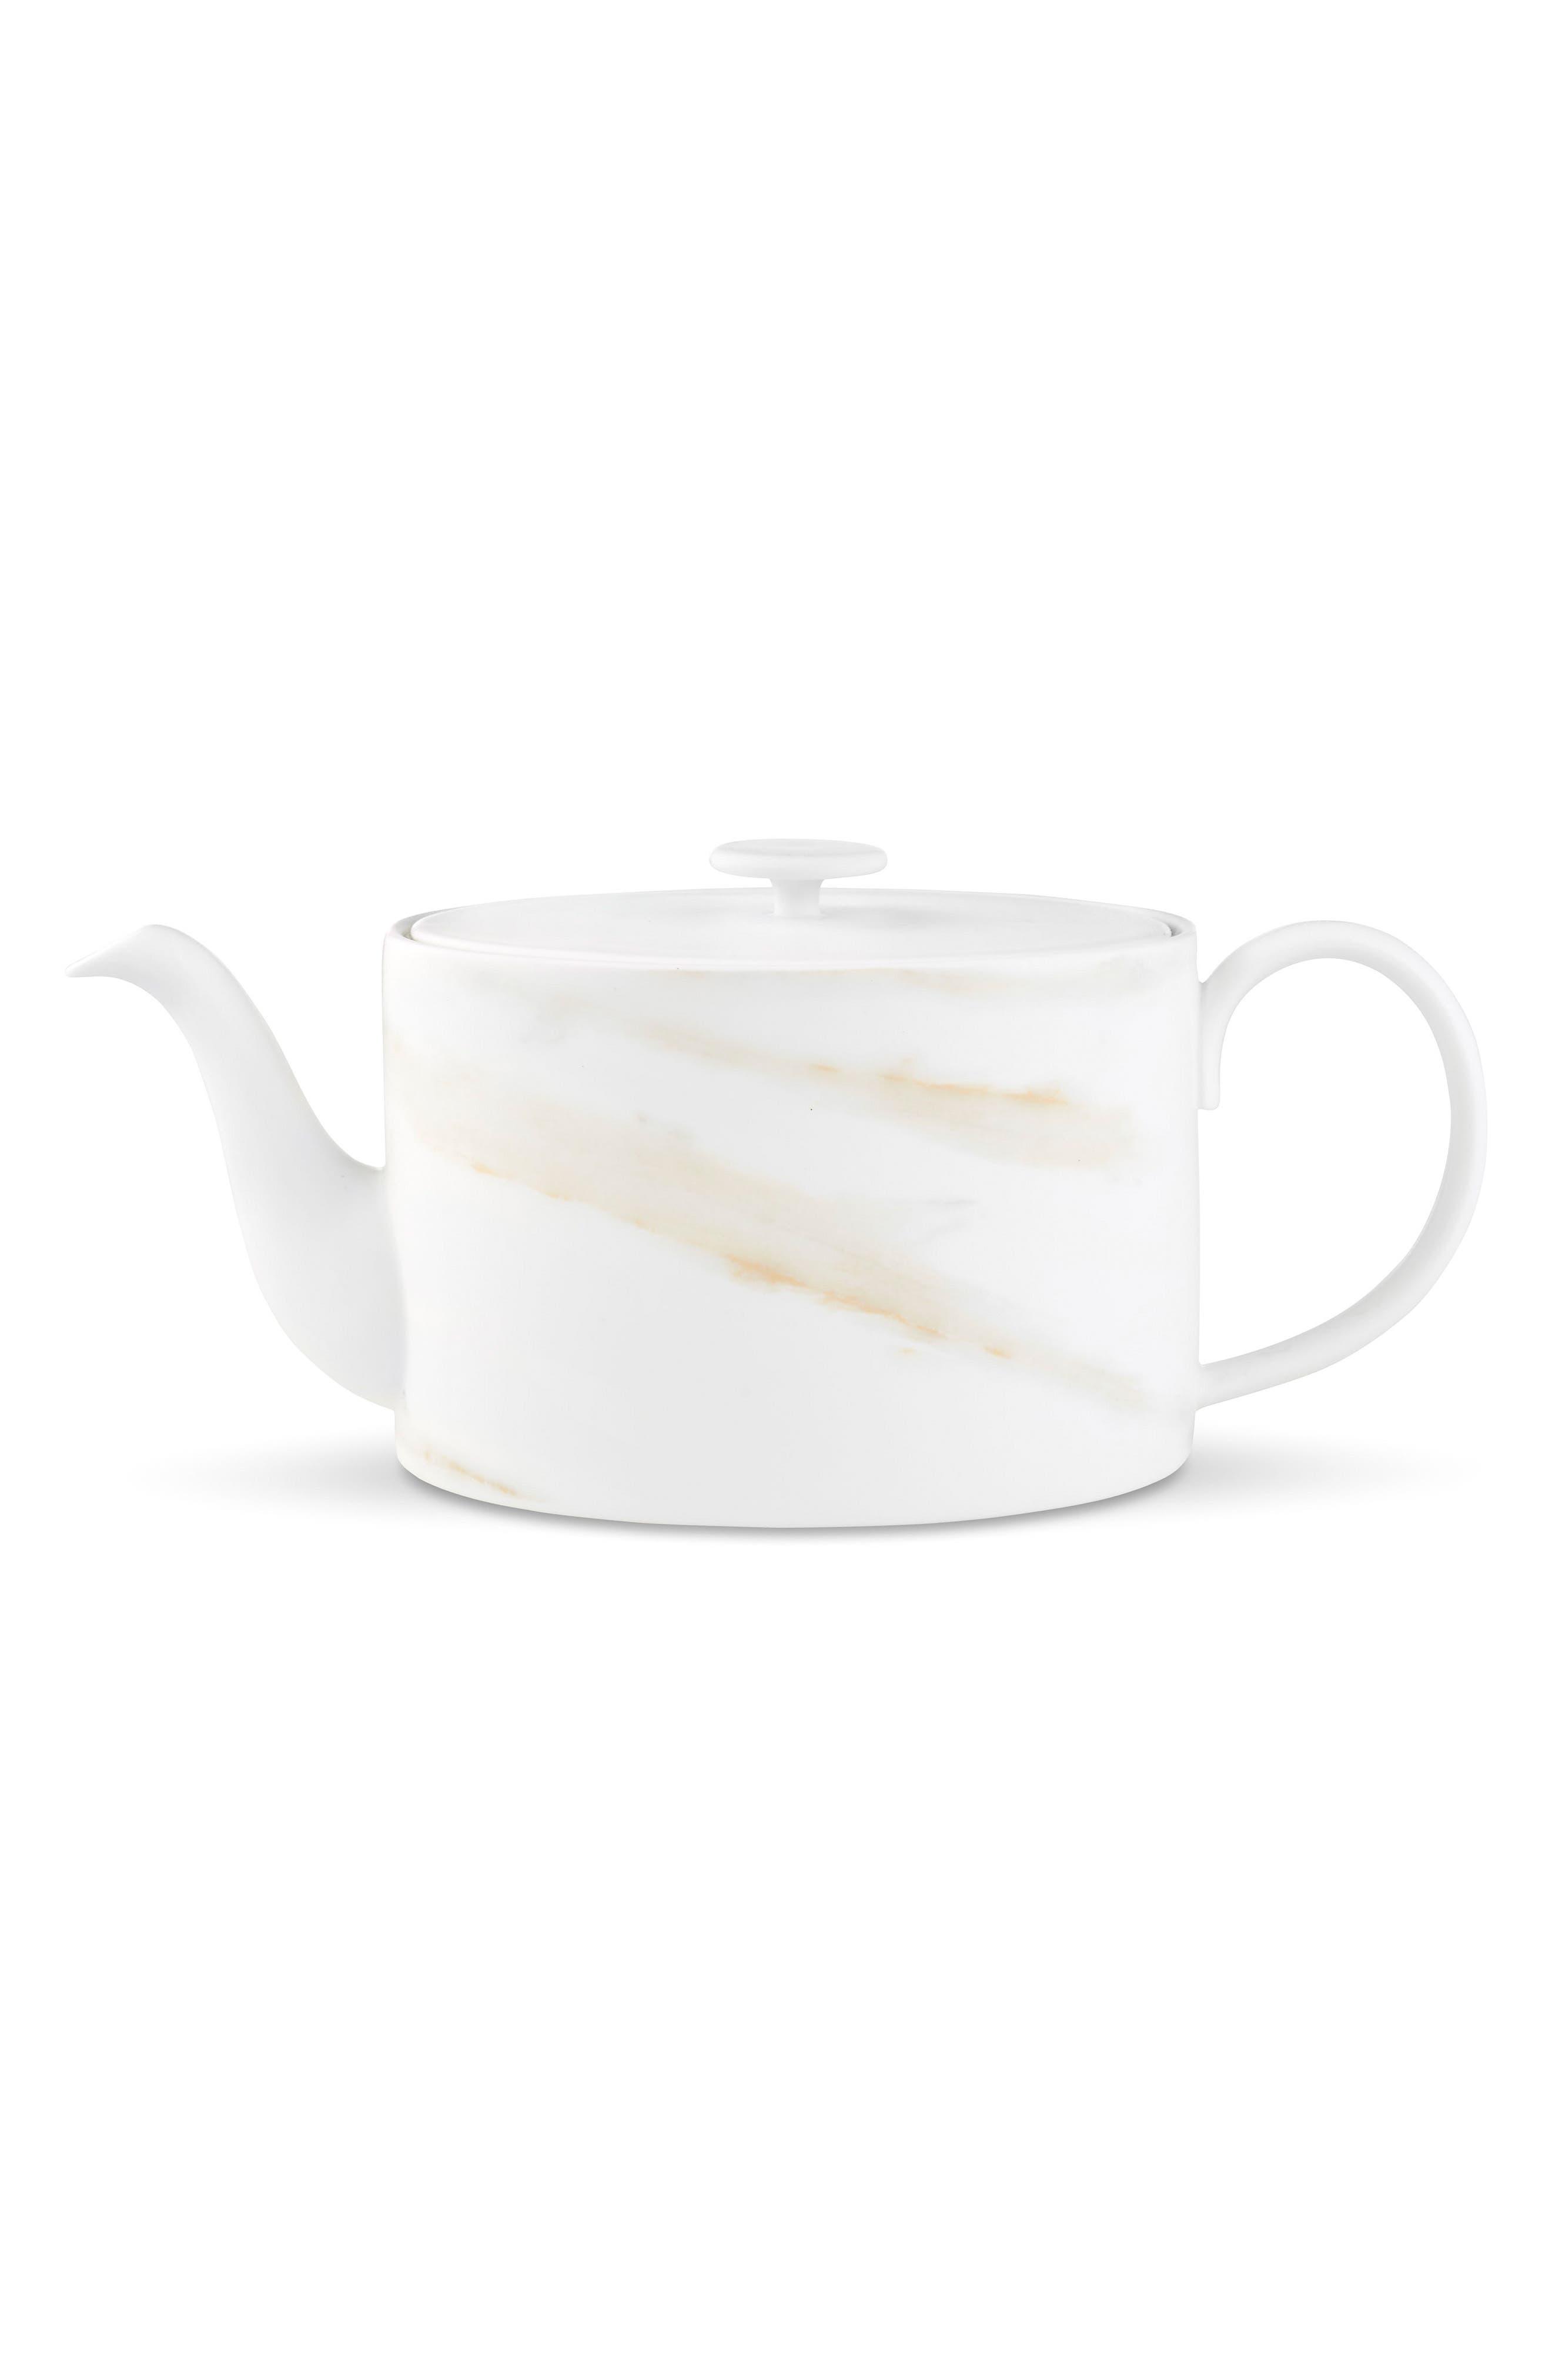 Main Image - Vera Wang x Wedgwood Venato Imperial Teapot